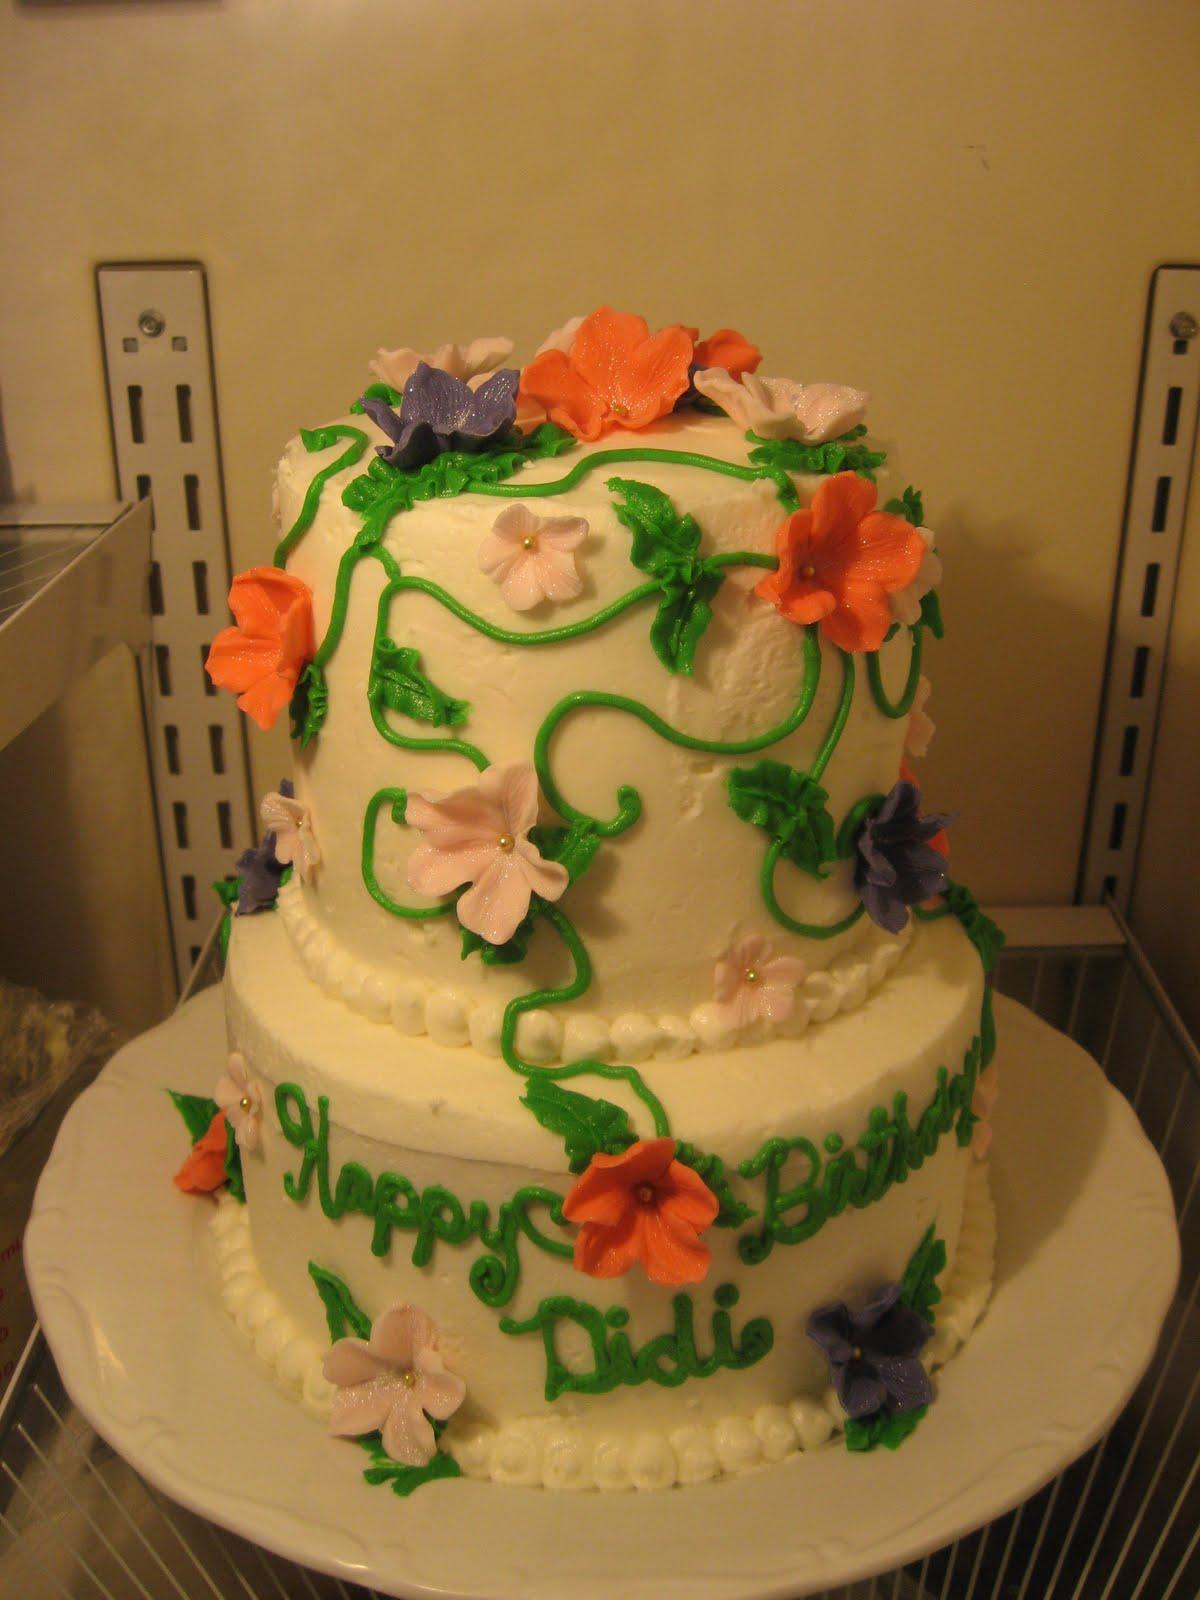 Sweetest Endeavors Birthday Cake